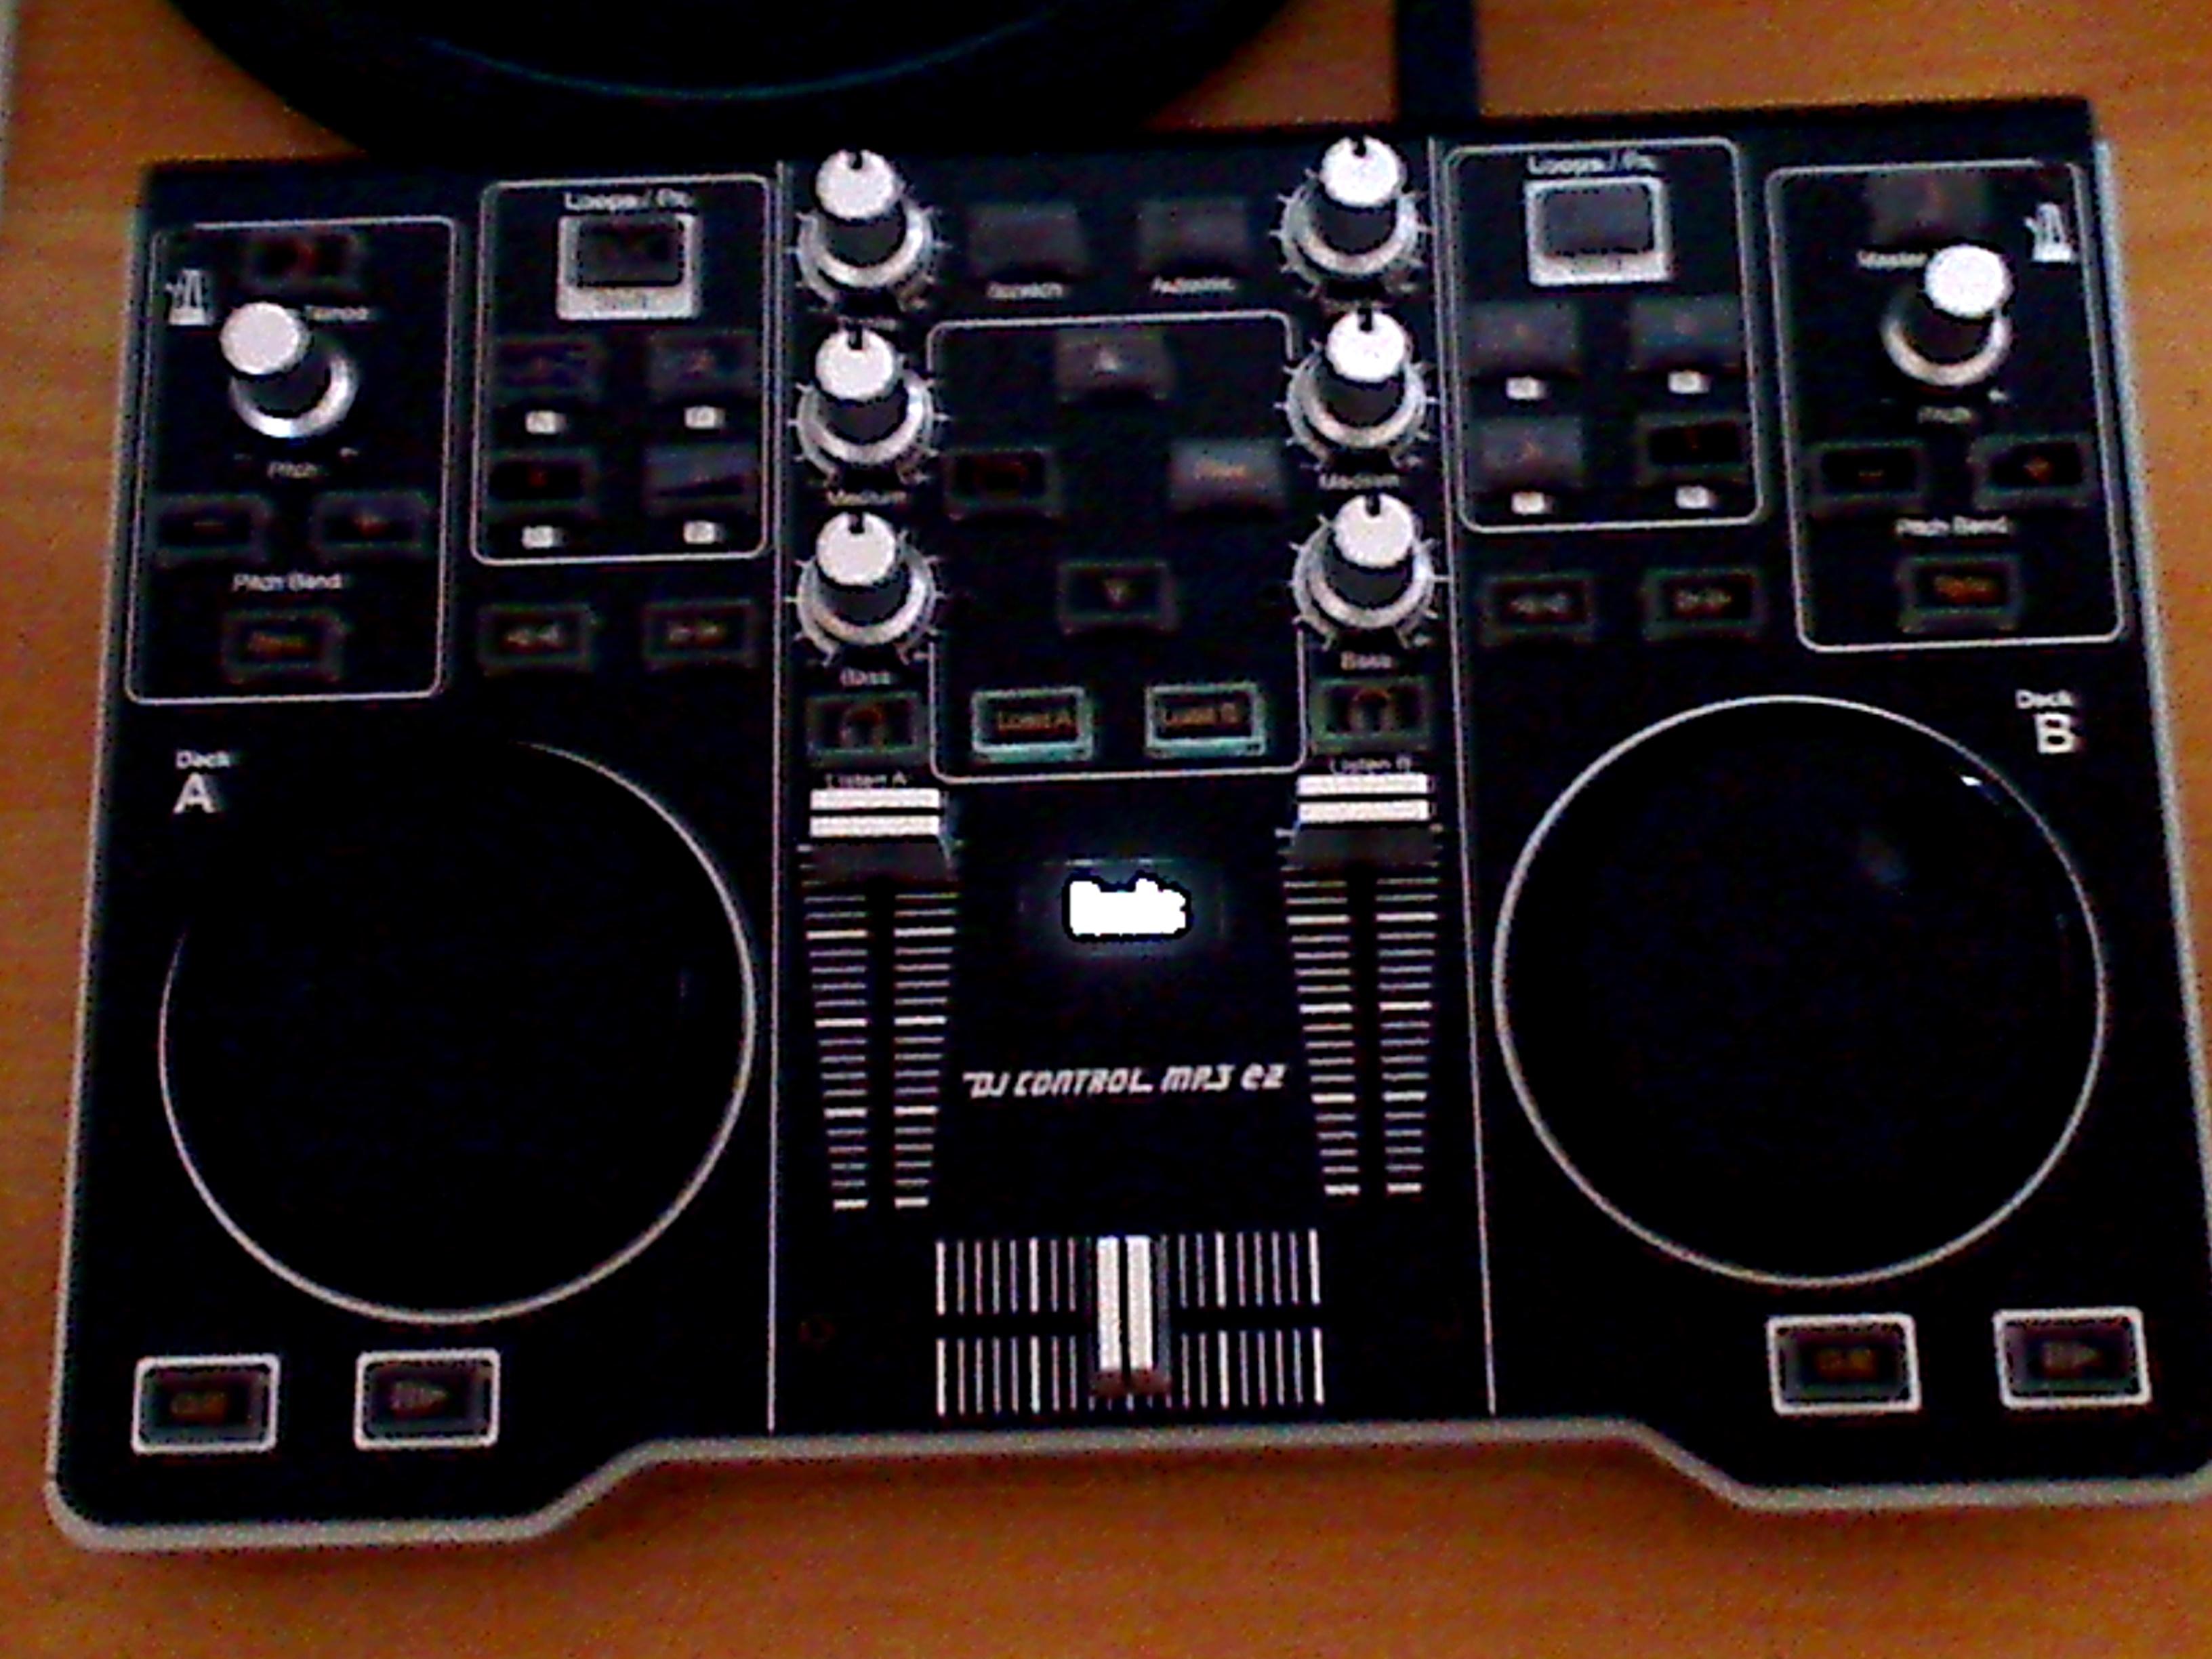 Hercules dj control mp3 e2 image 522575 audiofanzine - Table de mixage hercules dj control mp3 e2 ...